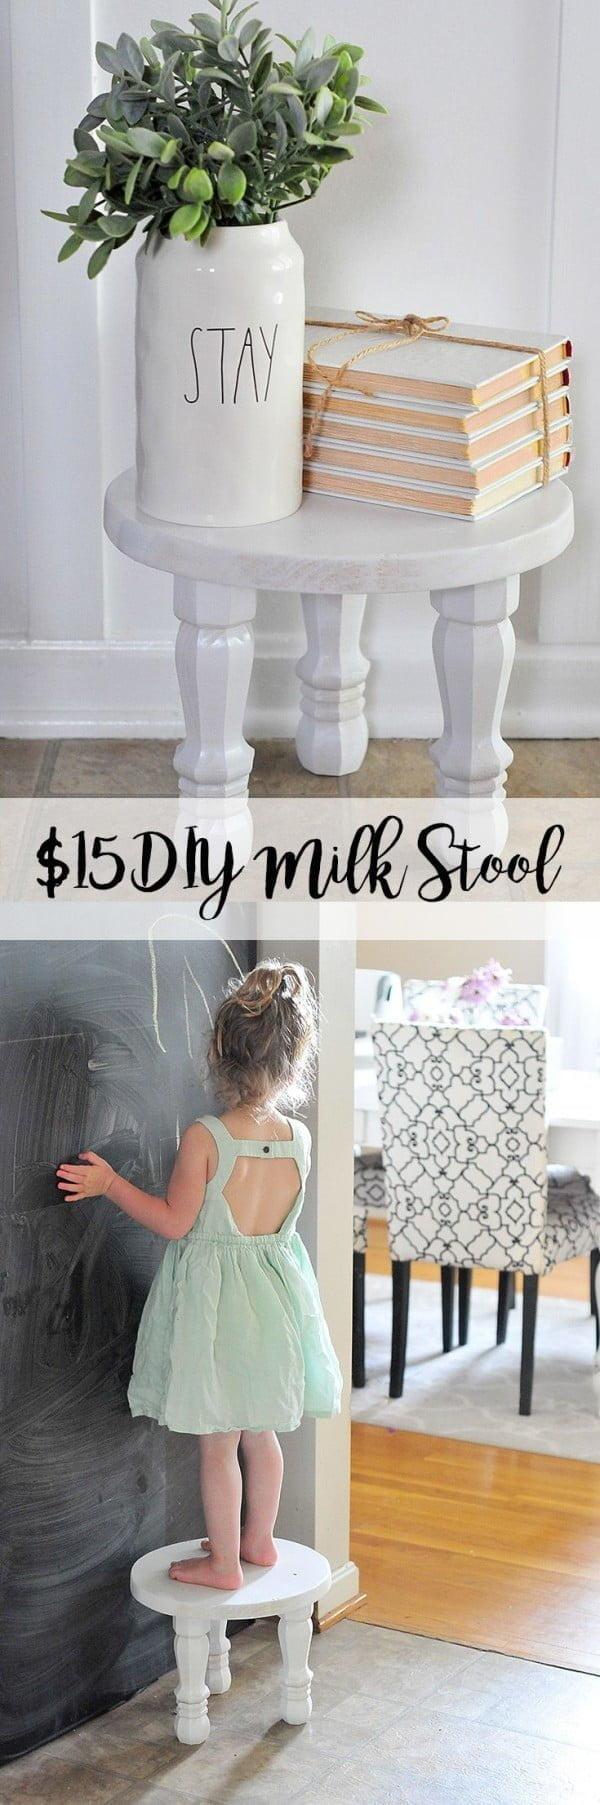 Check out the tutorial on how to make a #DIY #farmhouse milk stool. Looks easy enough! #HomeDecorIdeas